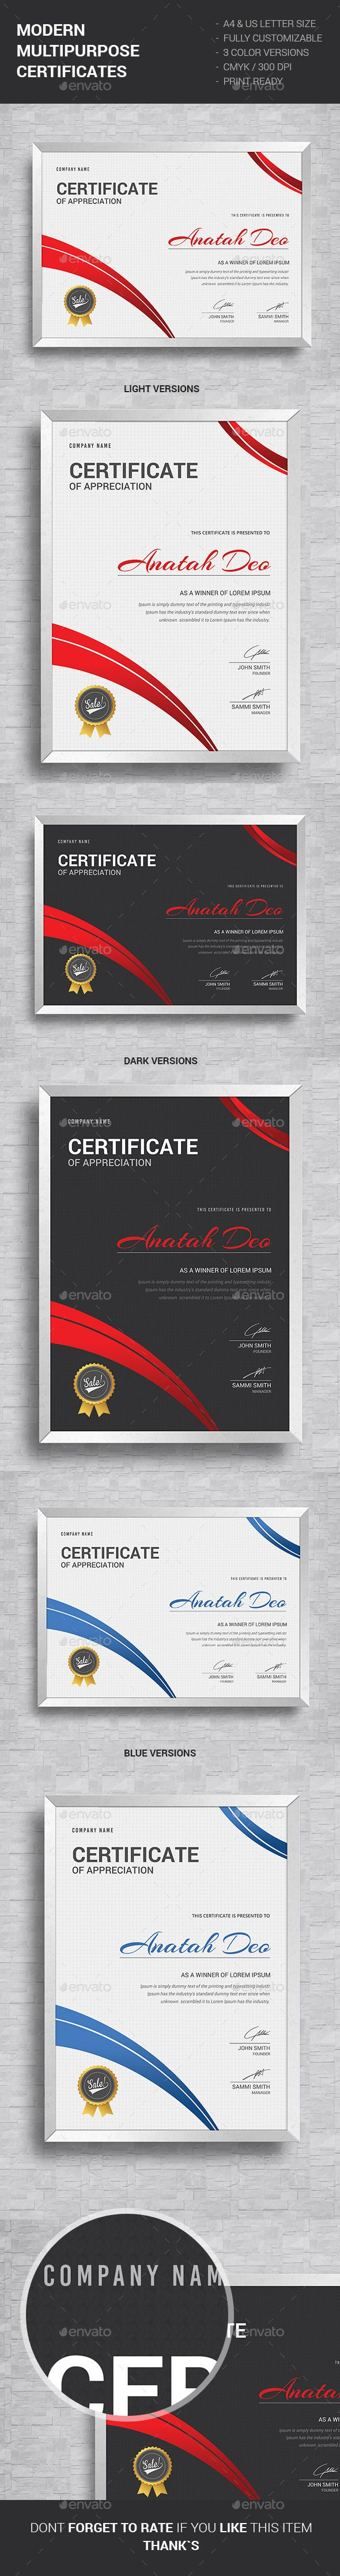 Modern Multipurpose Certificates Template PSD. Download here: http://graphicriver.net/item/modern-multipurpose-certificates/12612801?ref=ksioks